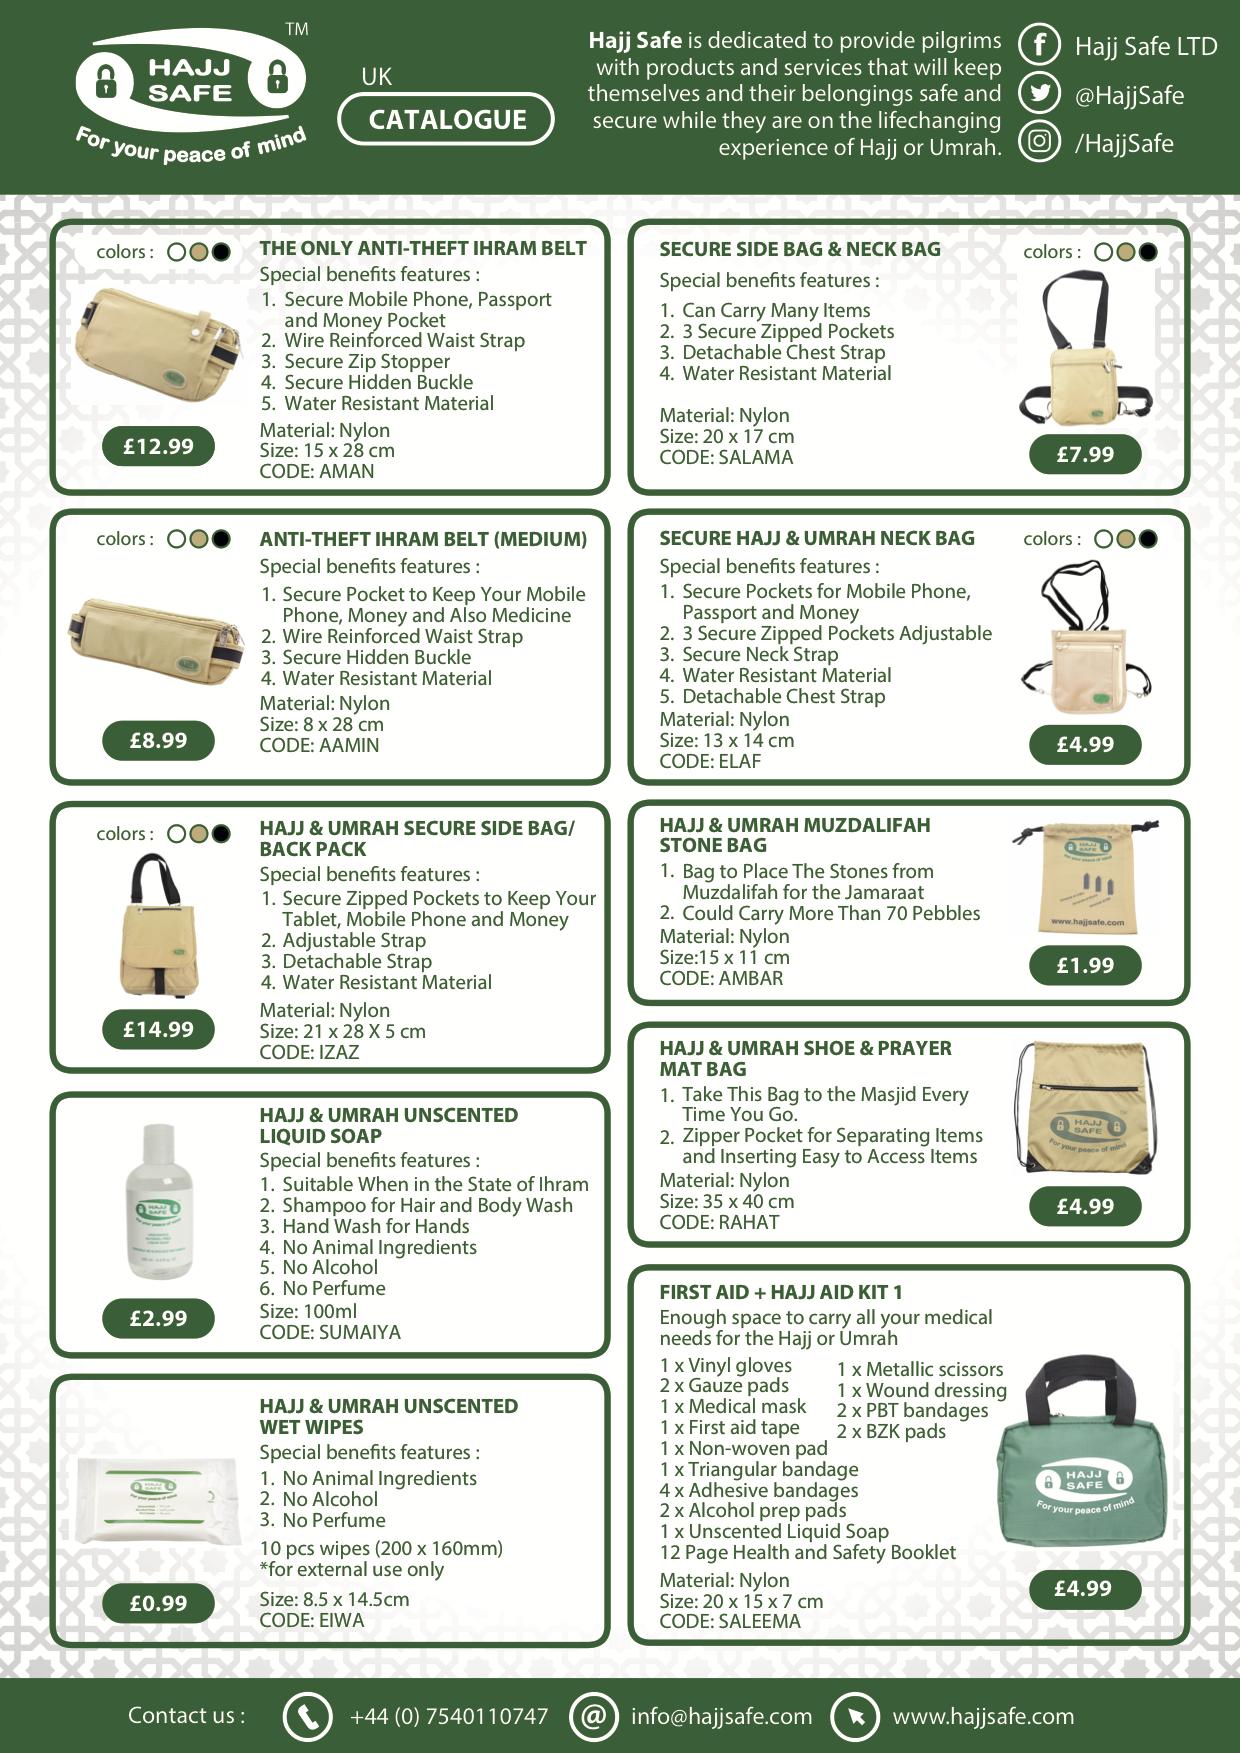 hajj-safe-catalogue-uk.png